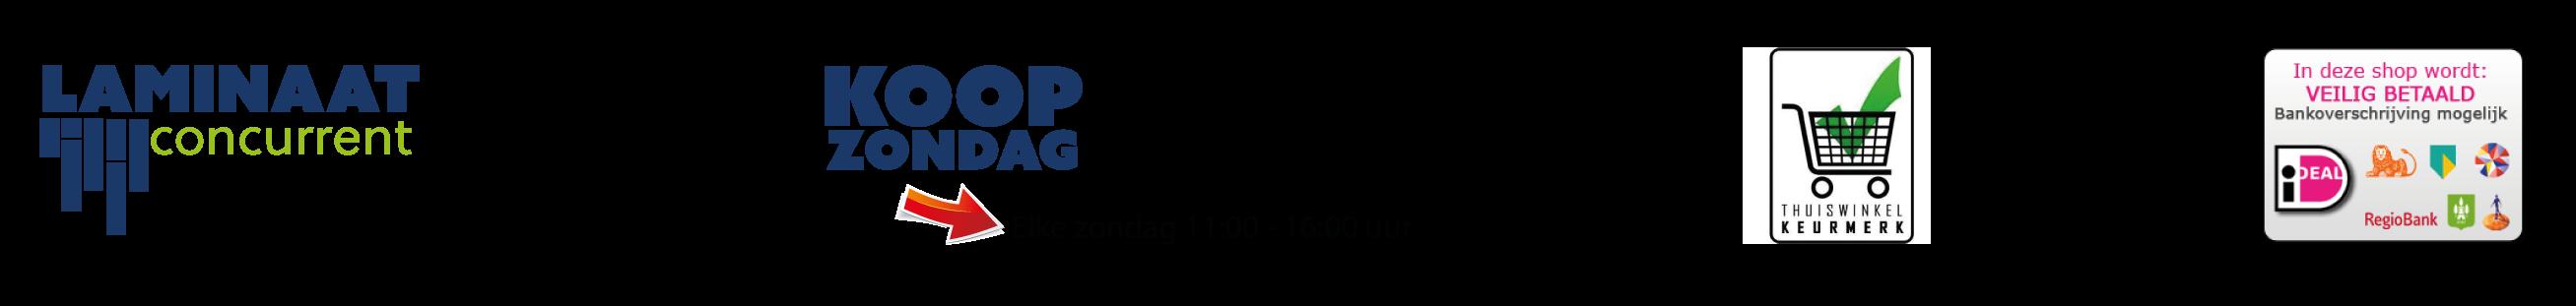 Laminaat Concurrent Retina Logo